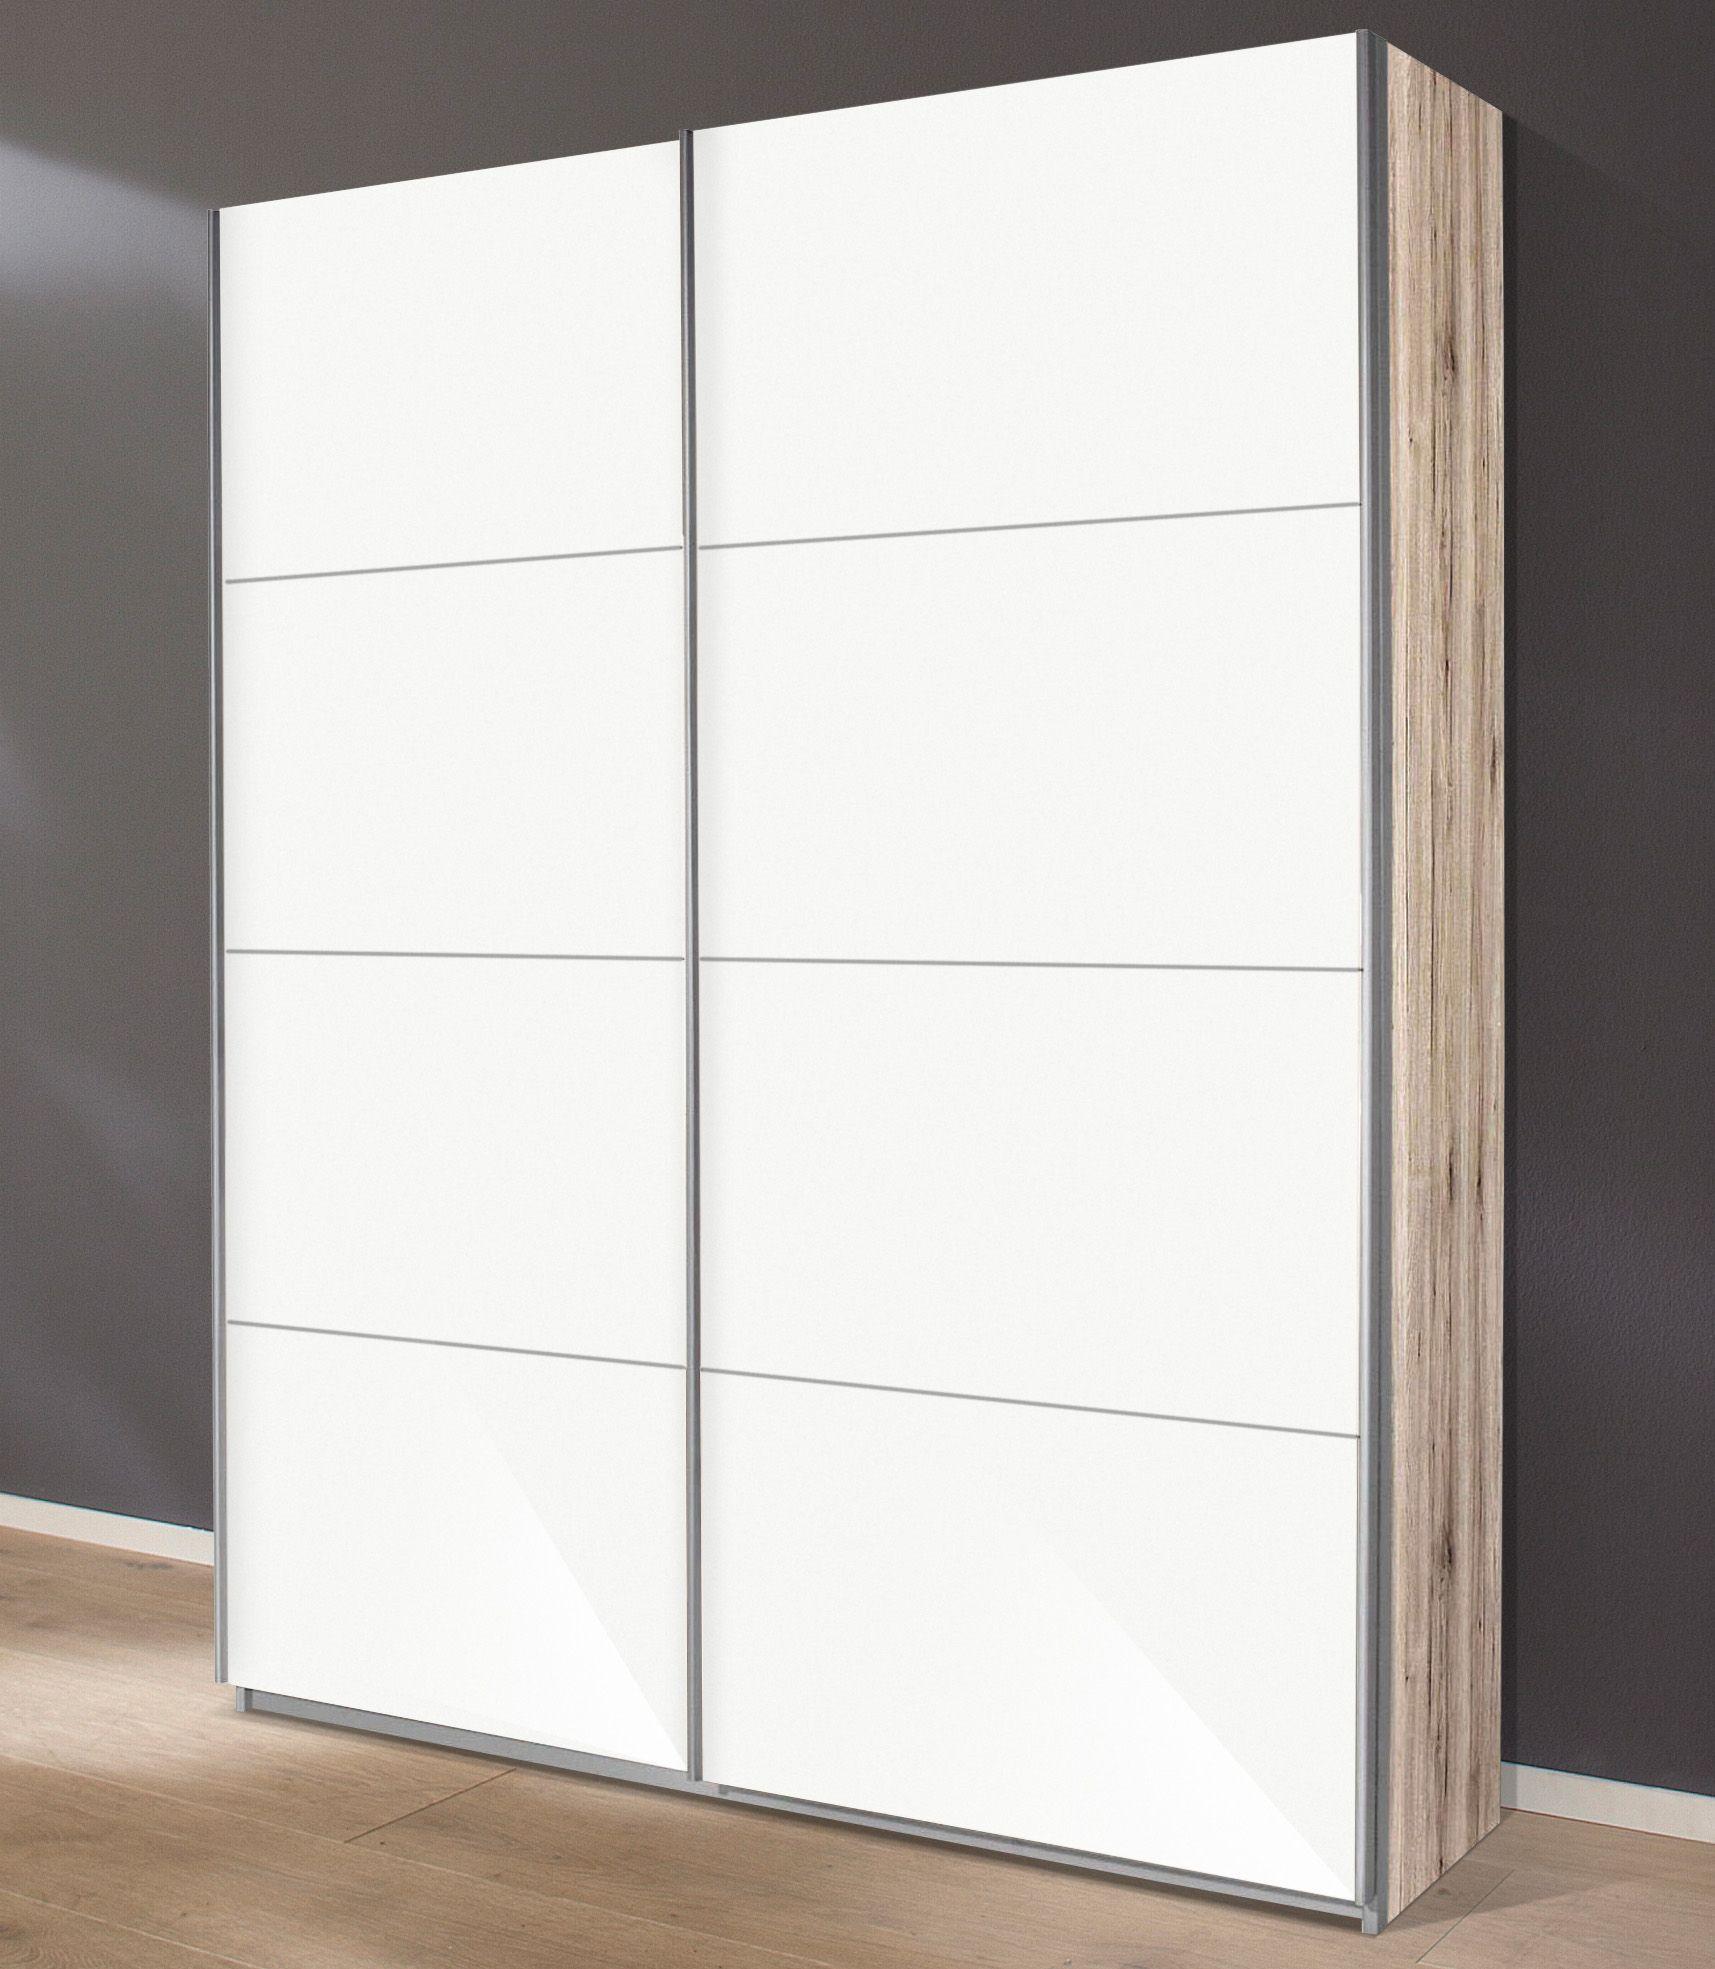 schwebet renschr nke im schwab online shop m bel. Black Bedroom Furniture Sets. Home Design Ideas